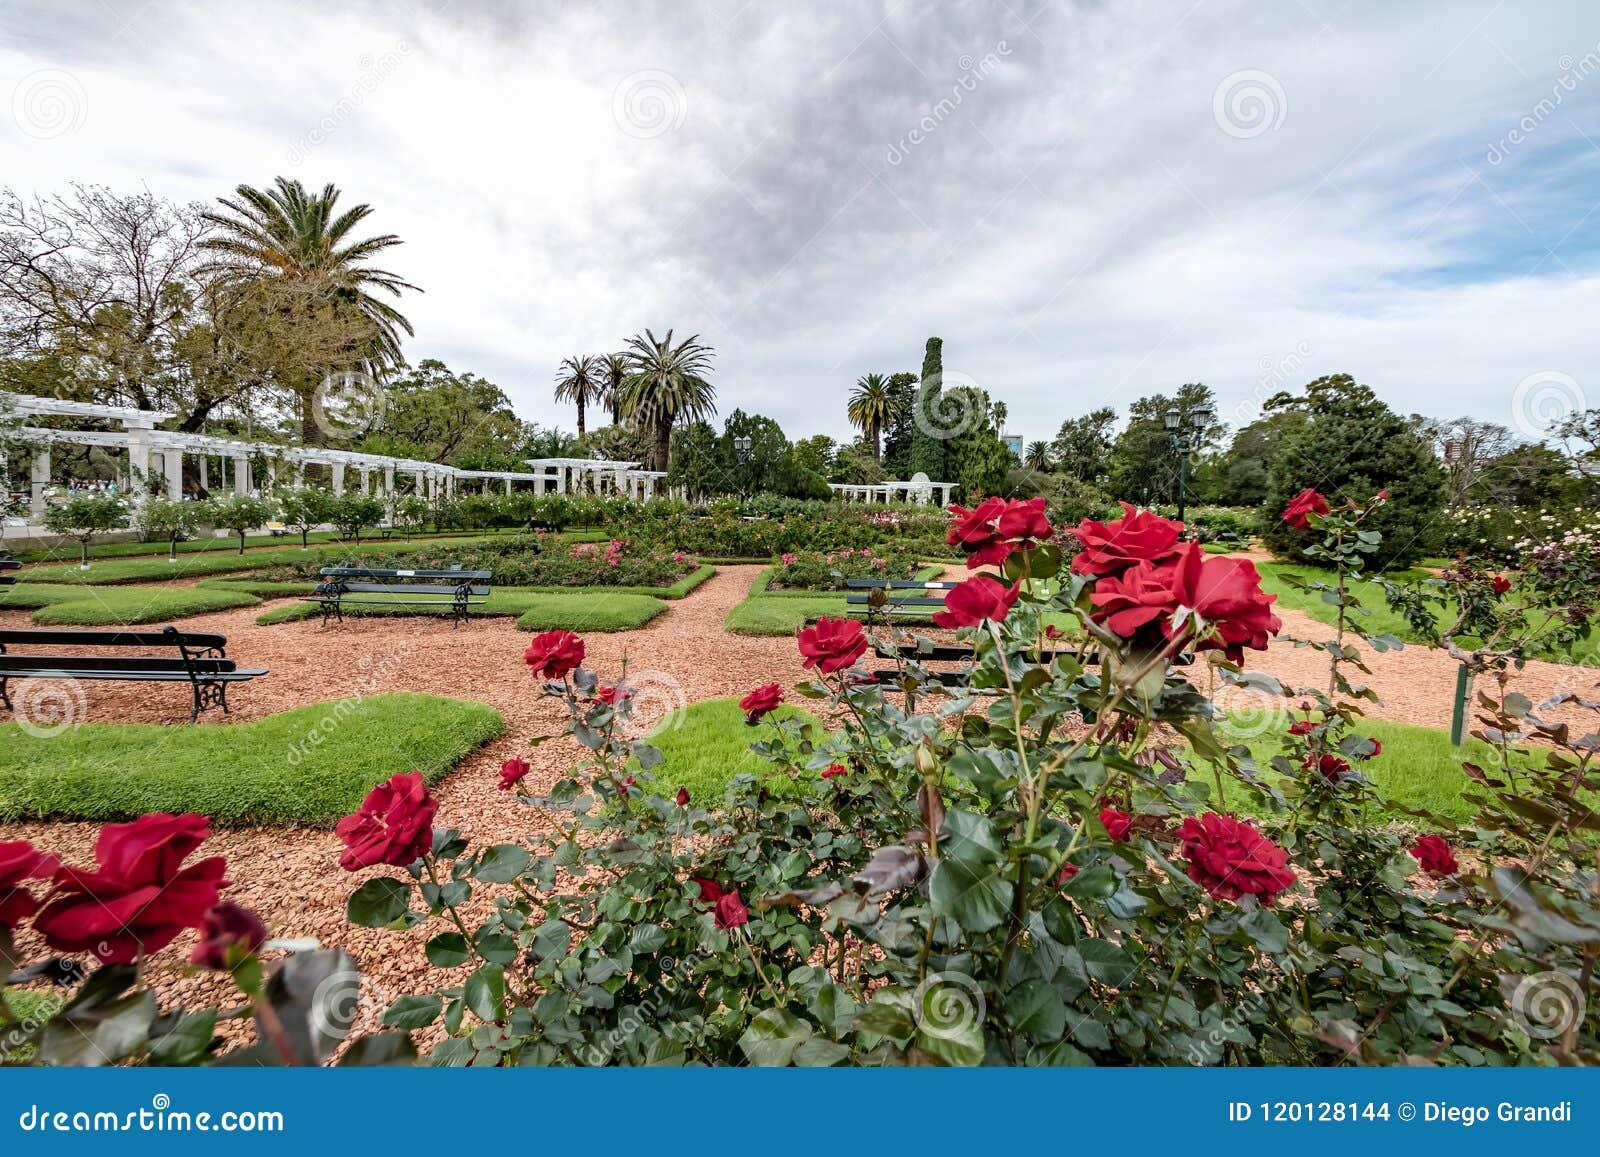 El Rosedal Rose Park at Bosques de Palermo - Buenos Aires, Argentina